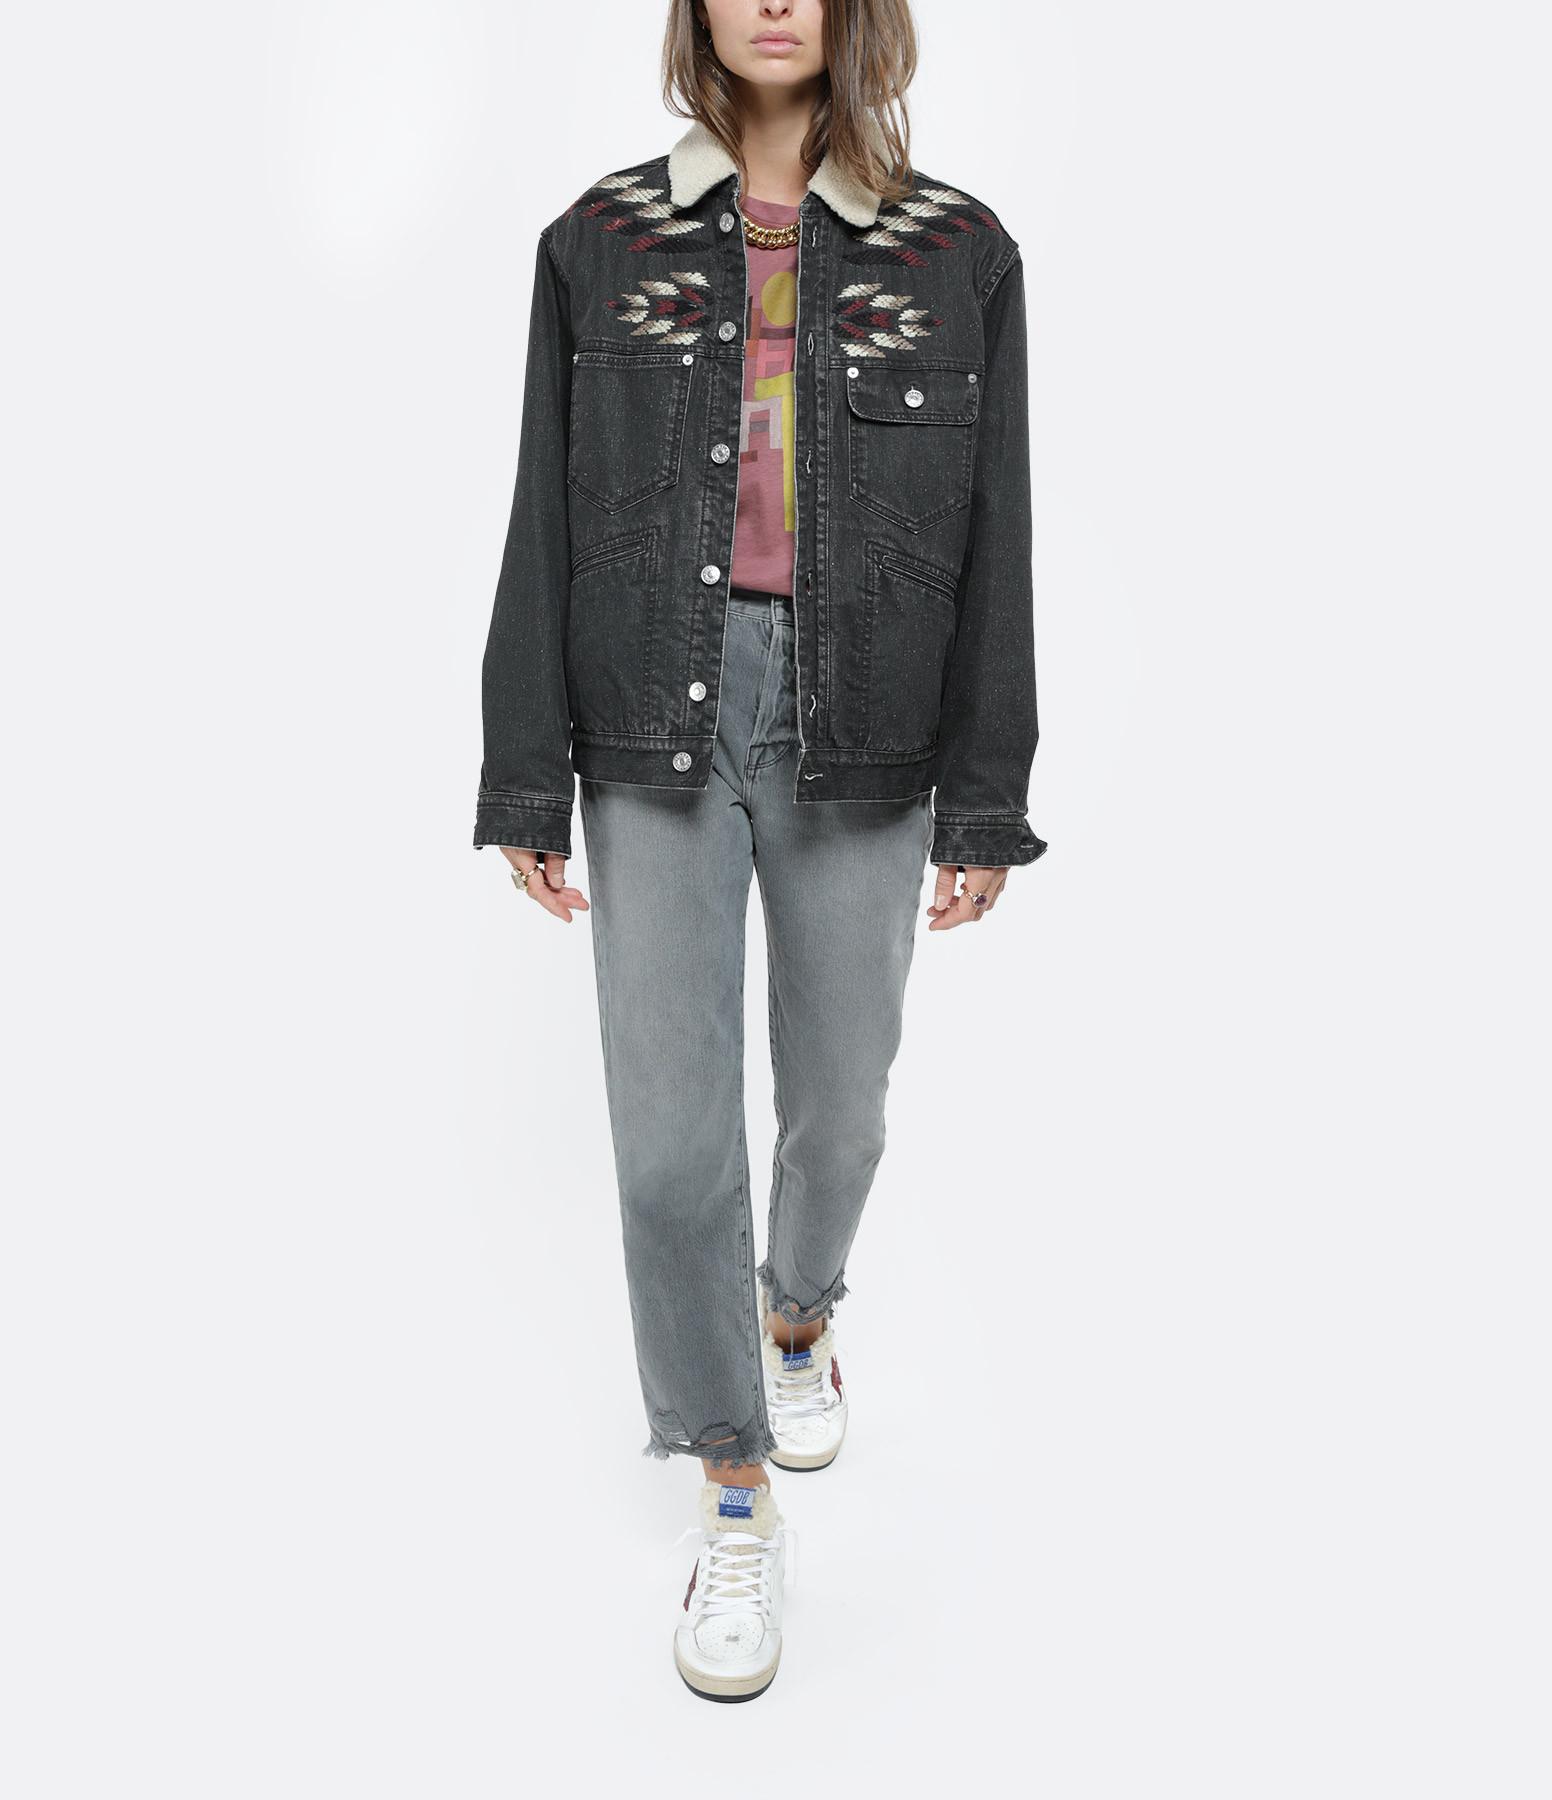 ISABEL MARANT ÉTOILE - Tee-shirt Zewel Coton Rose